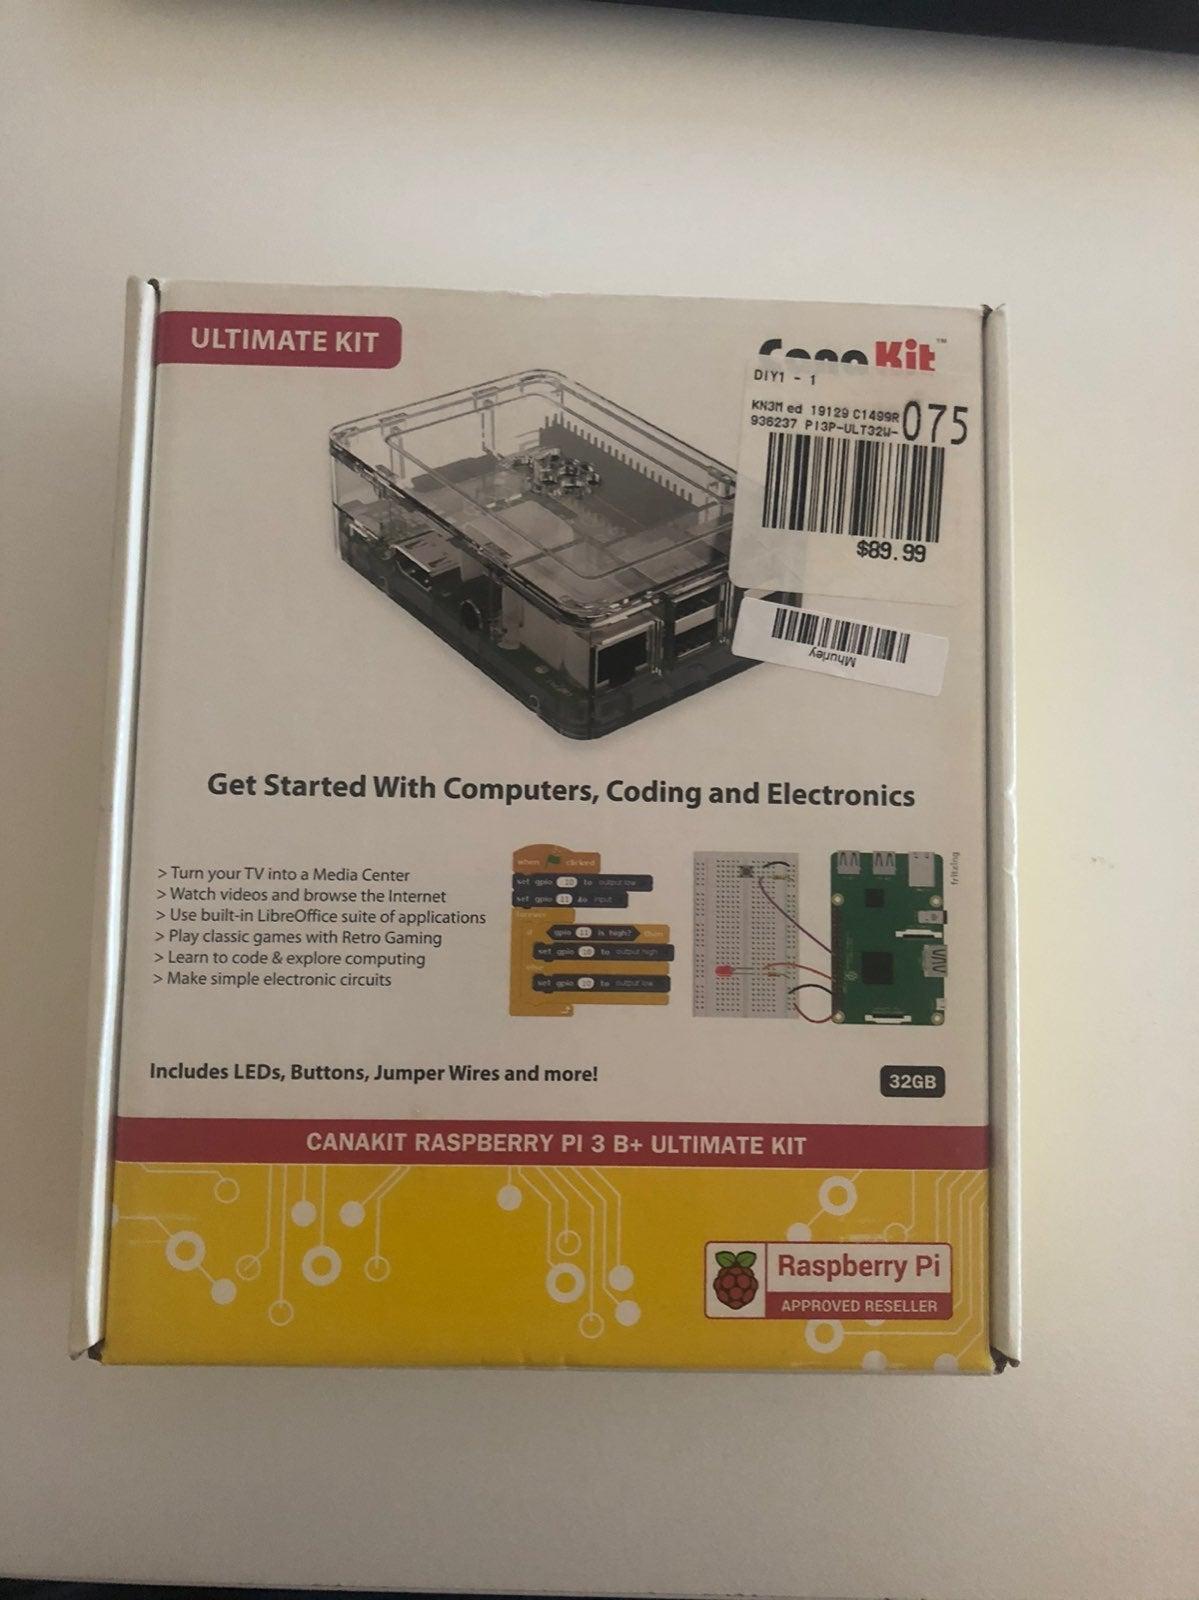 Raspberry Pi 3 B+ Ultimate Kit